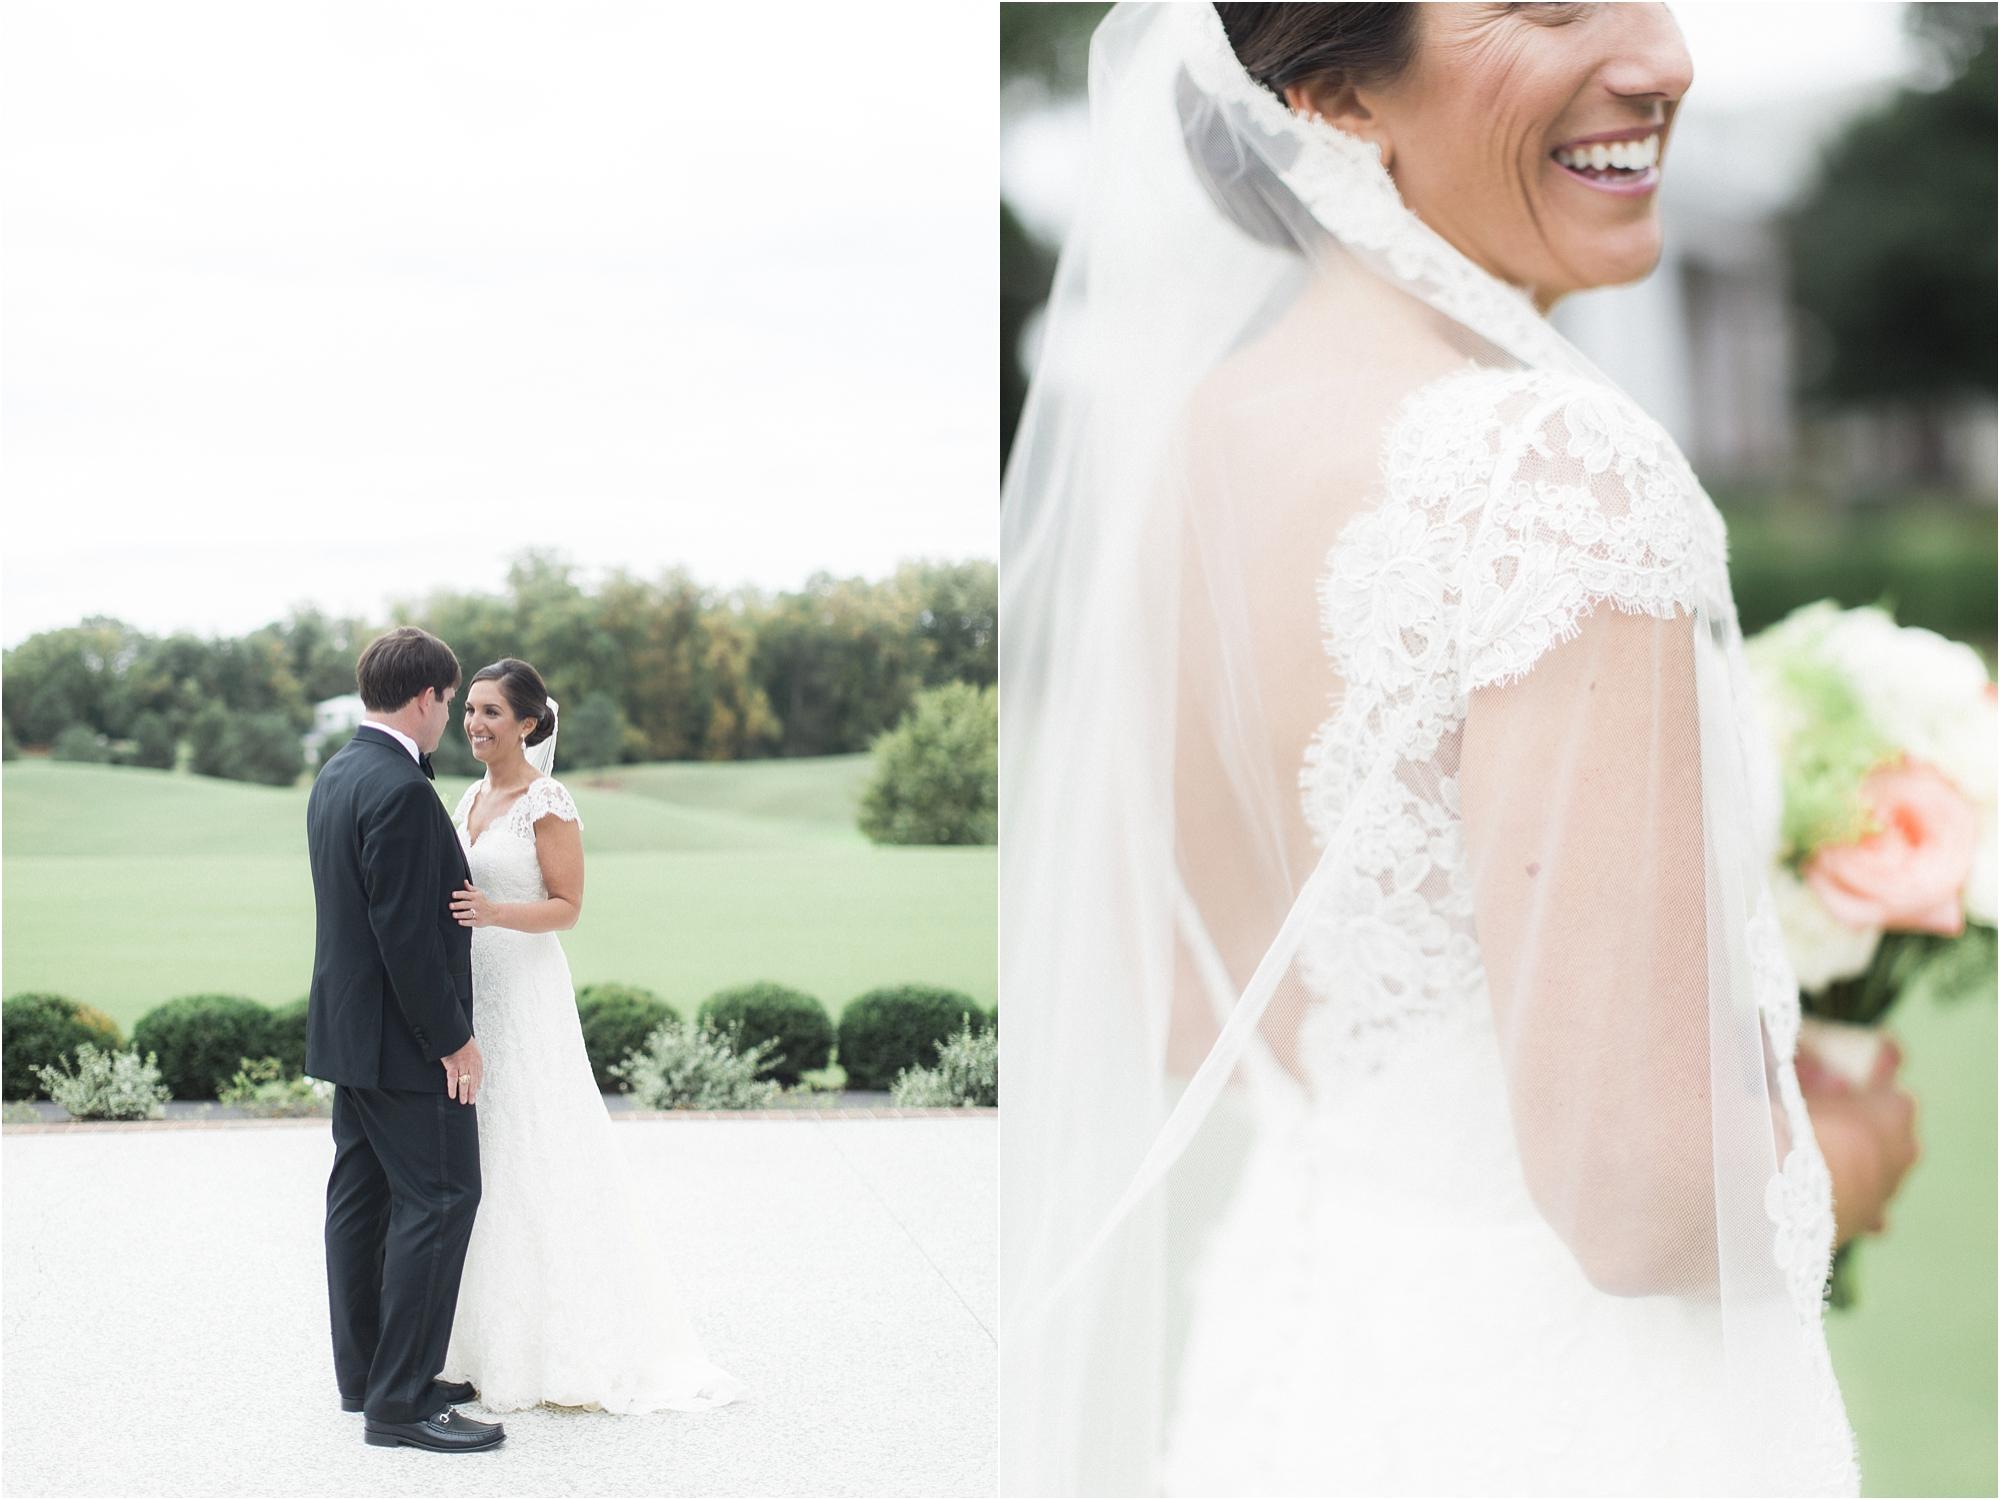 stephanie-yonce-photography-richmond-virginia-country-club-wedding-photo_016.JPG